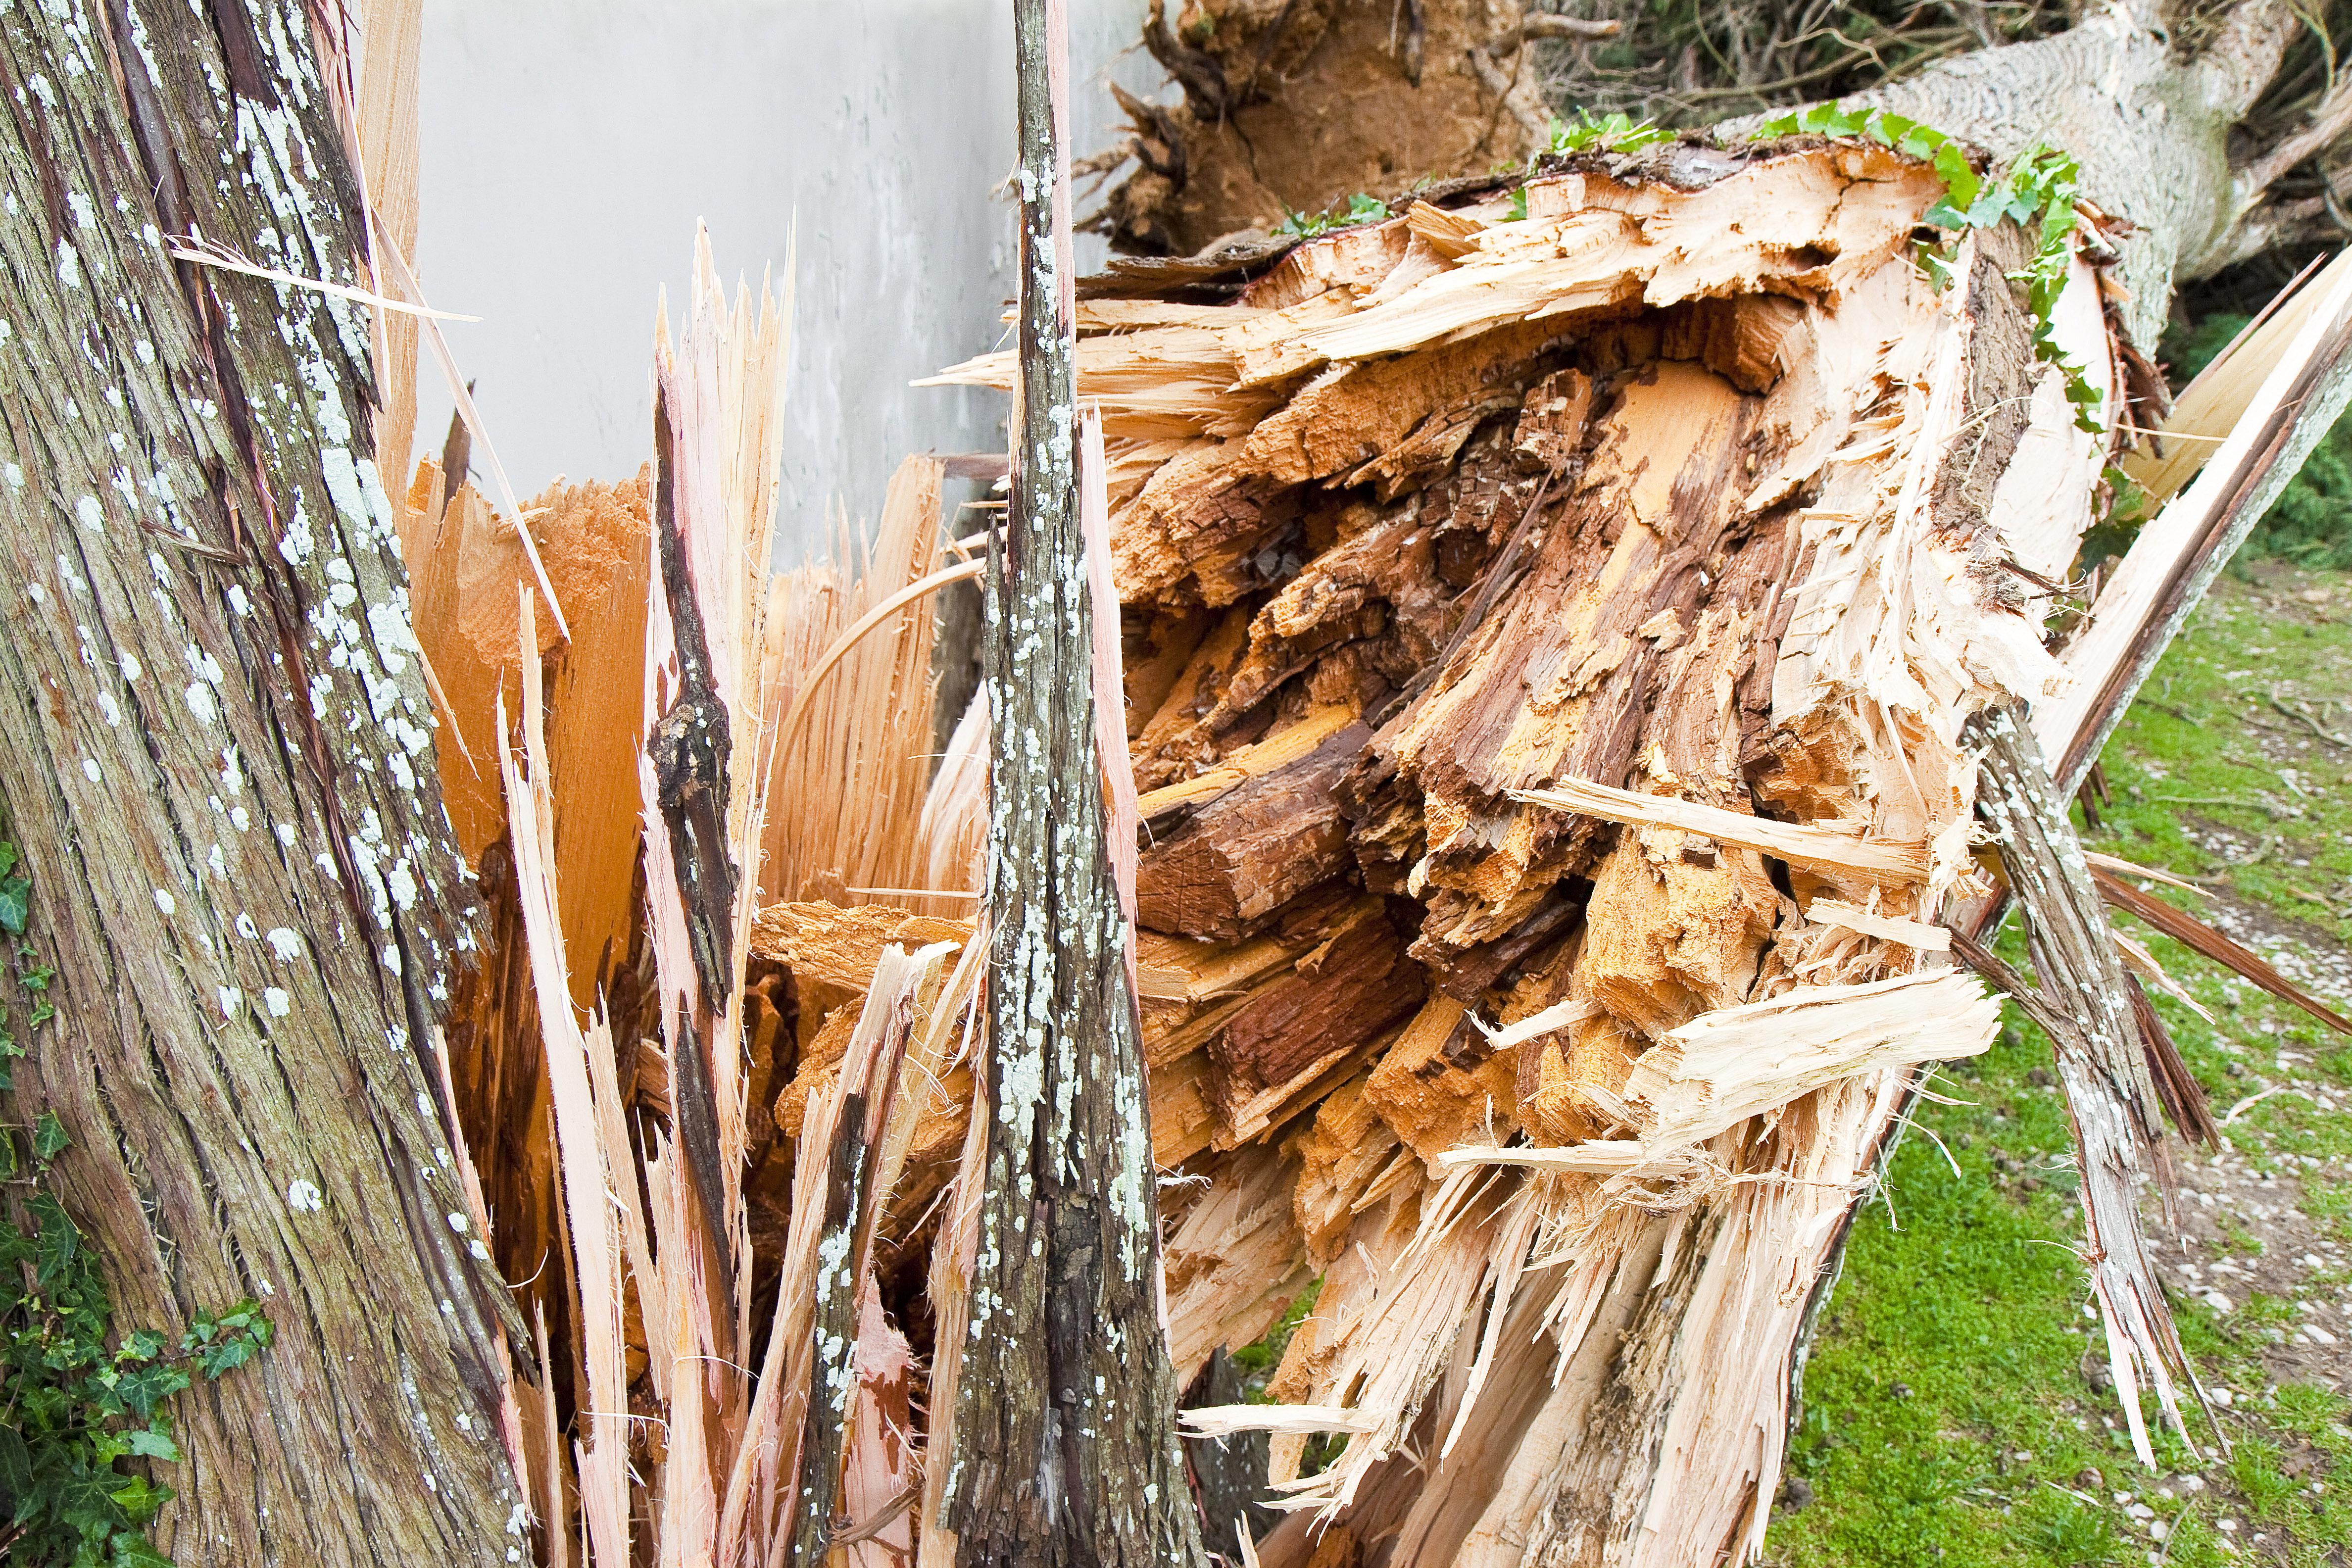 Cypress tree fallen after a wind storm